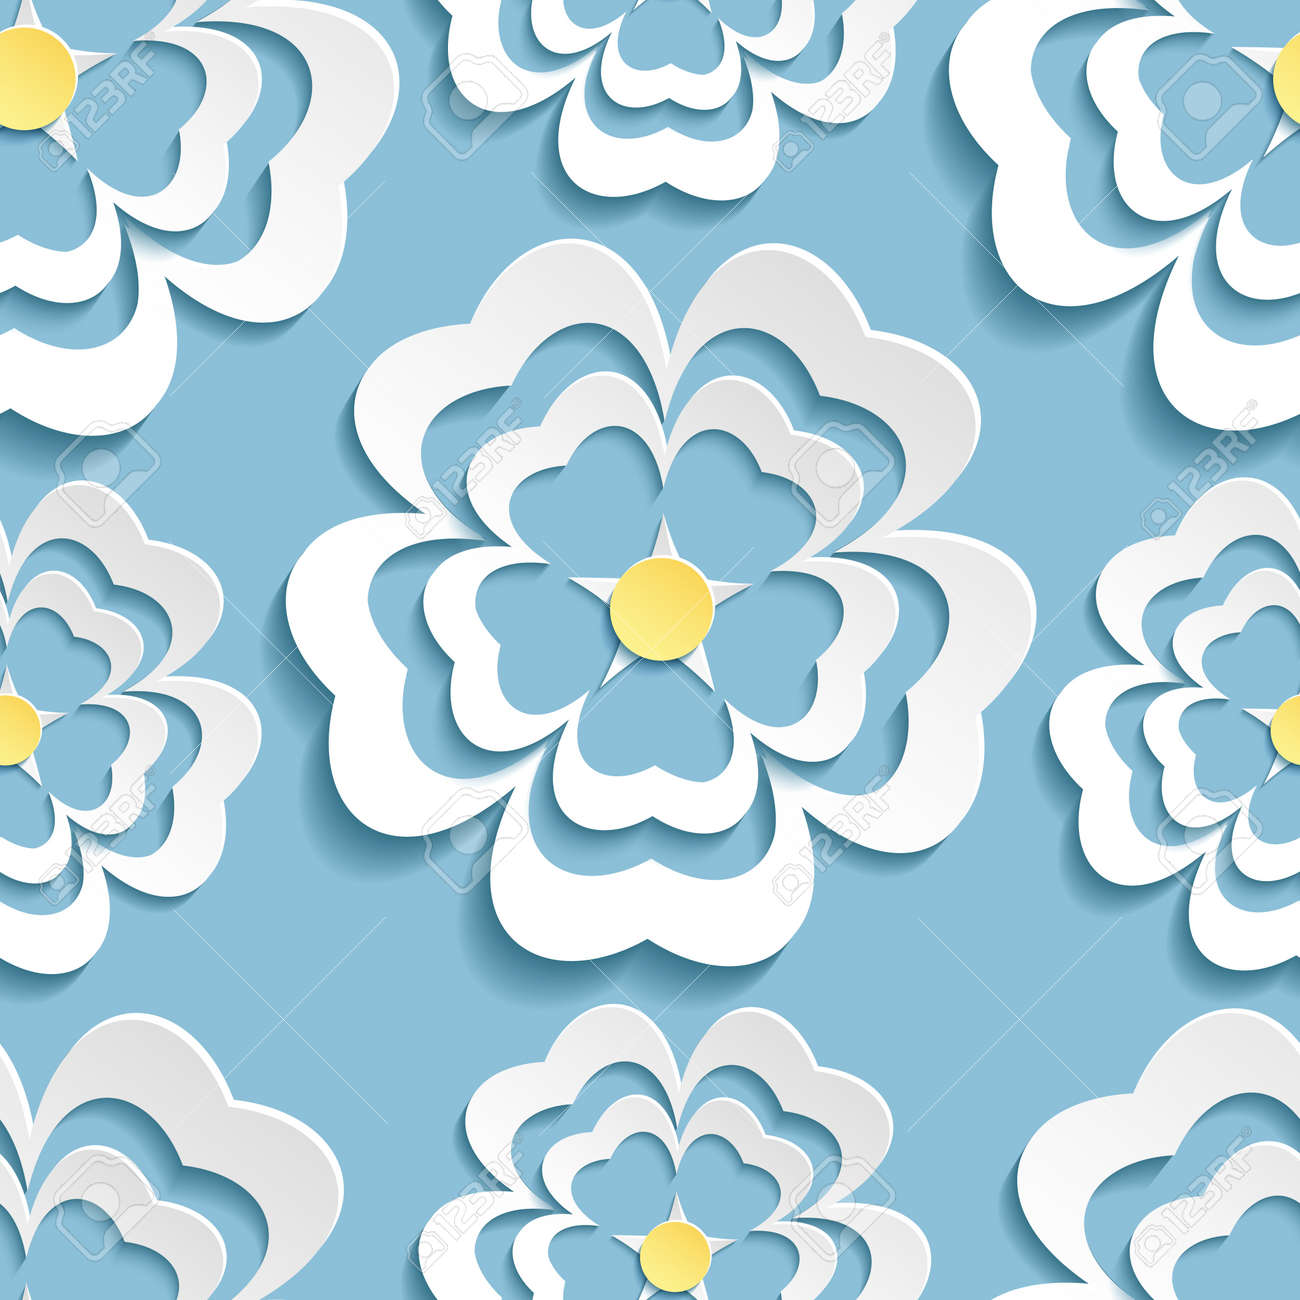 Beautiful Modern Nature Background Seamless Pattern Blue Whith White Ornate  Stylized Blossoming 3d Flower Sakura Japanese